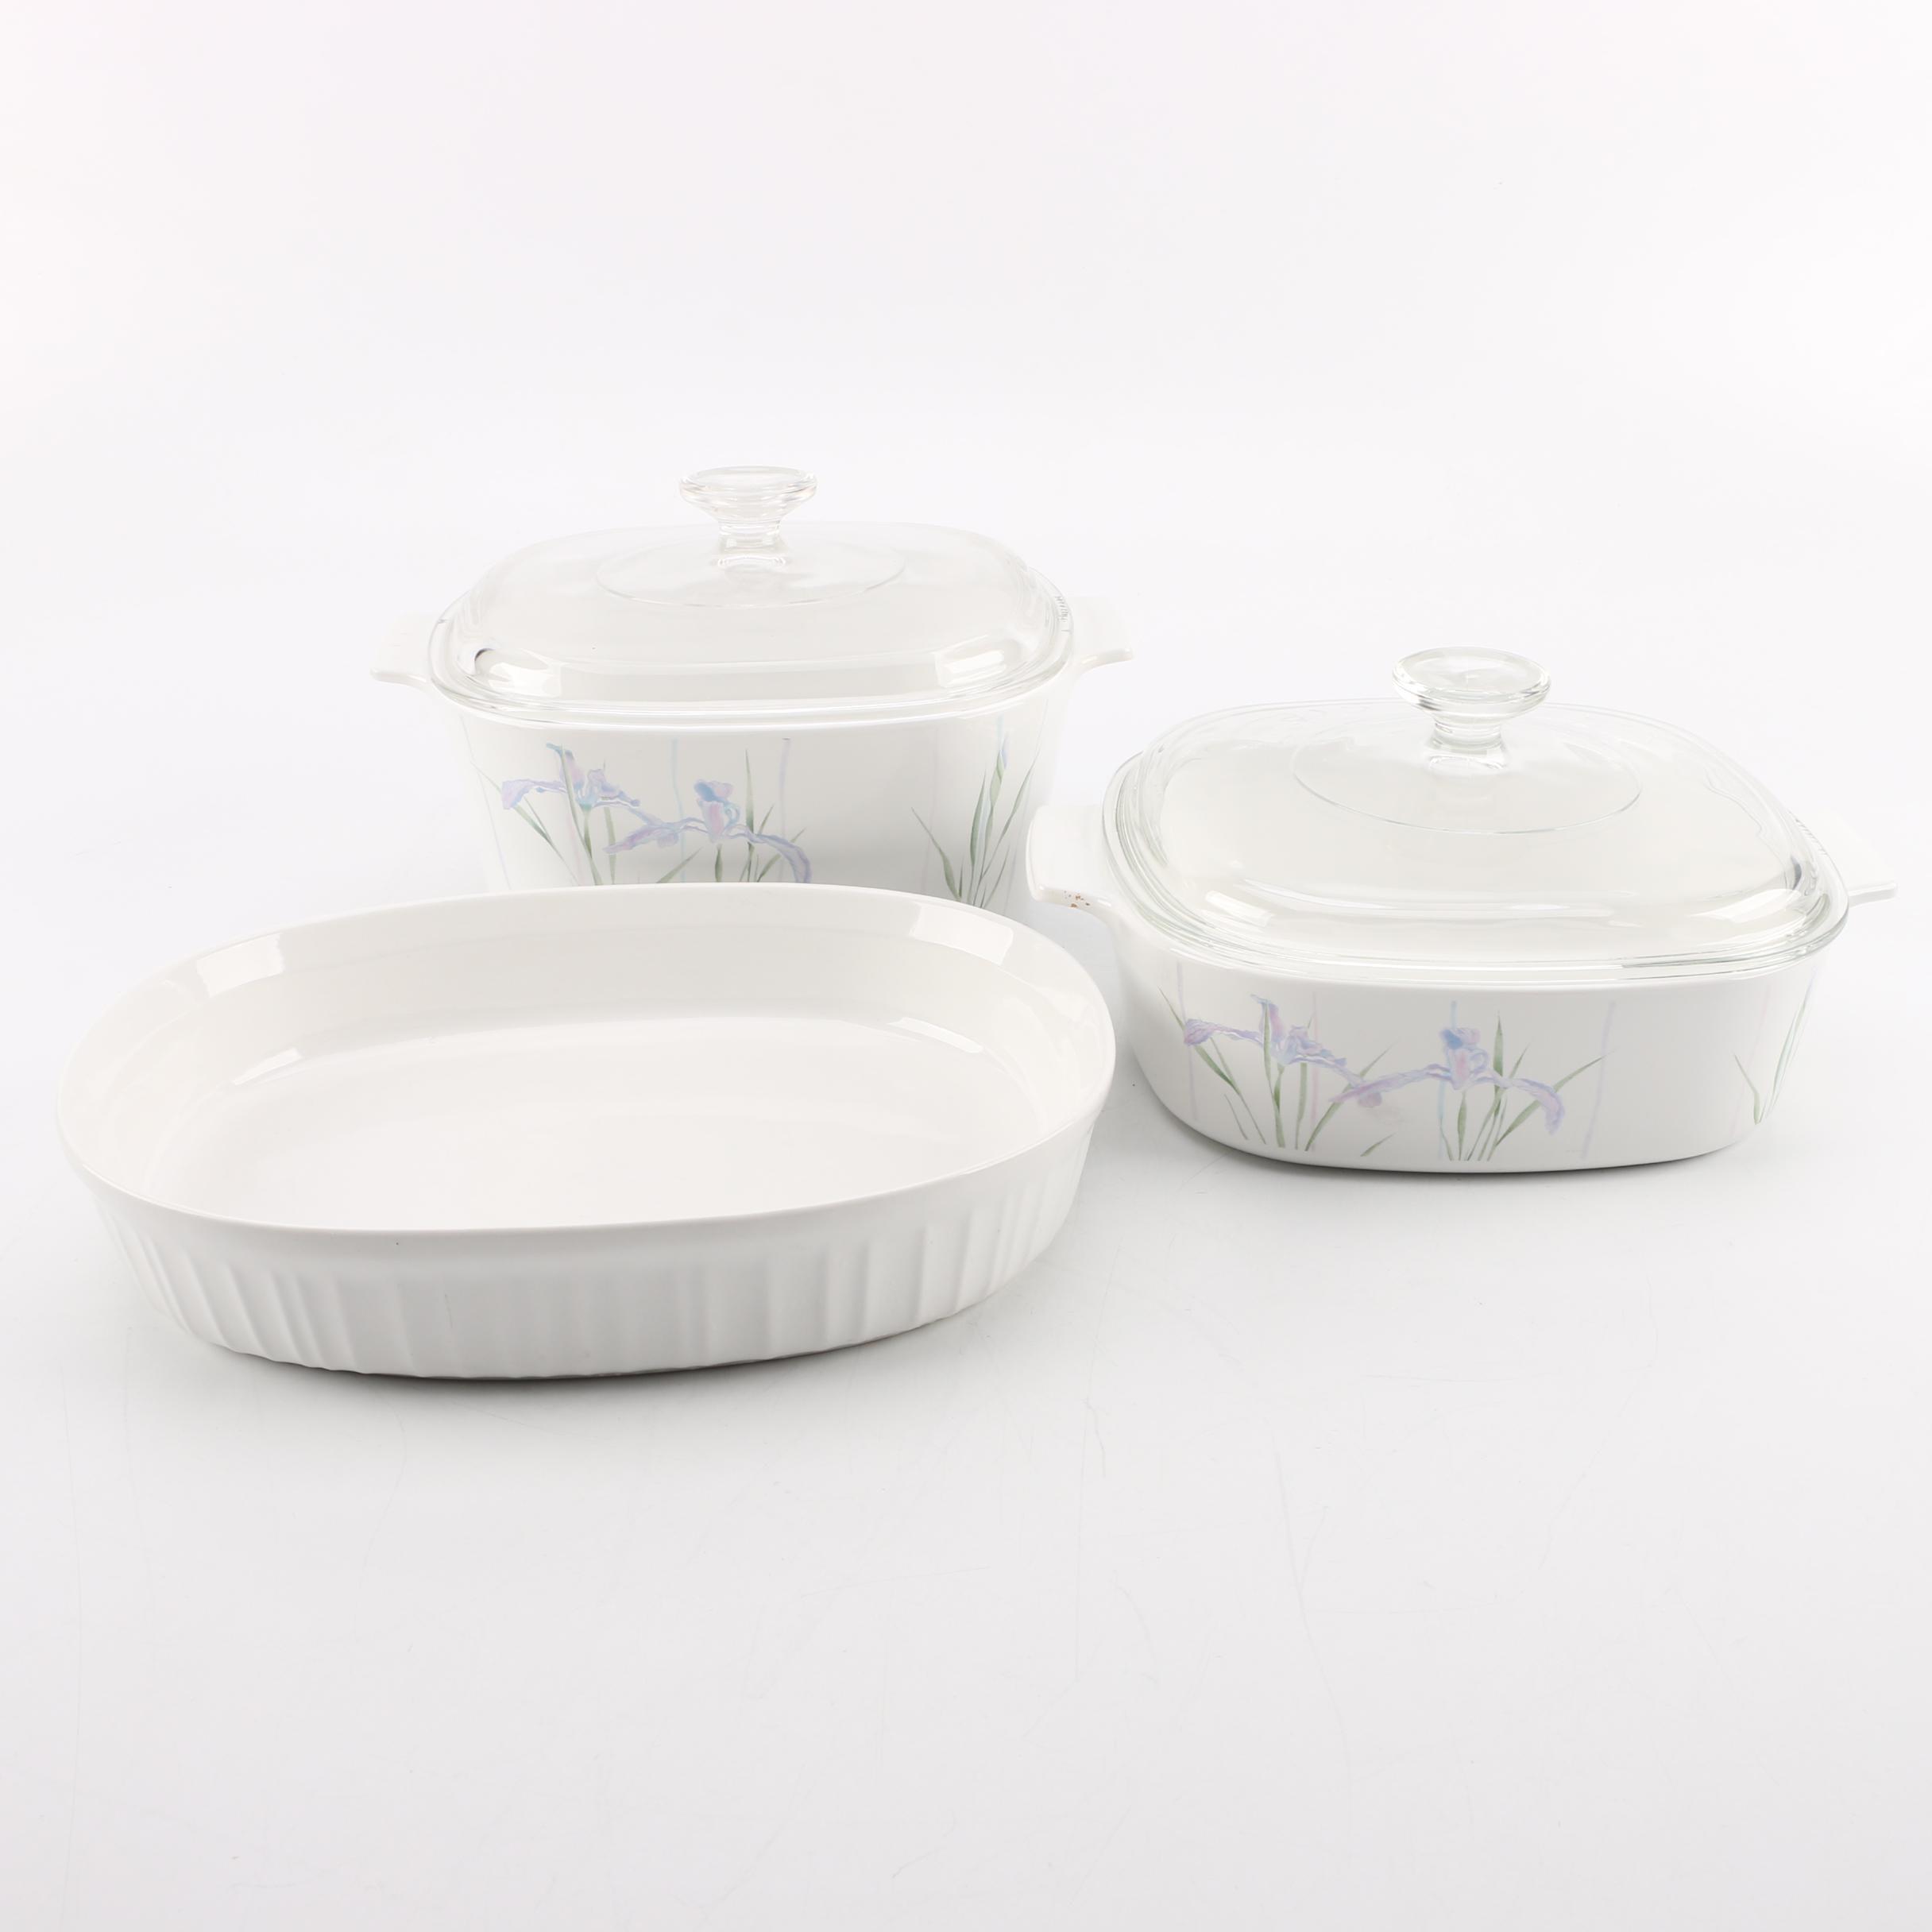 Corning Ware Corelle Shadow Iris and French White Bakeware EBTH